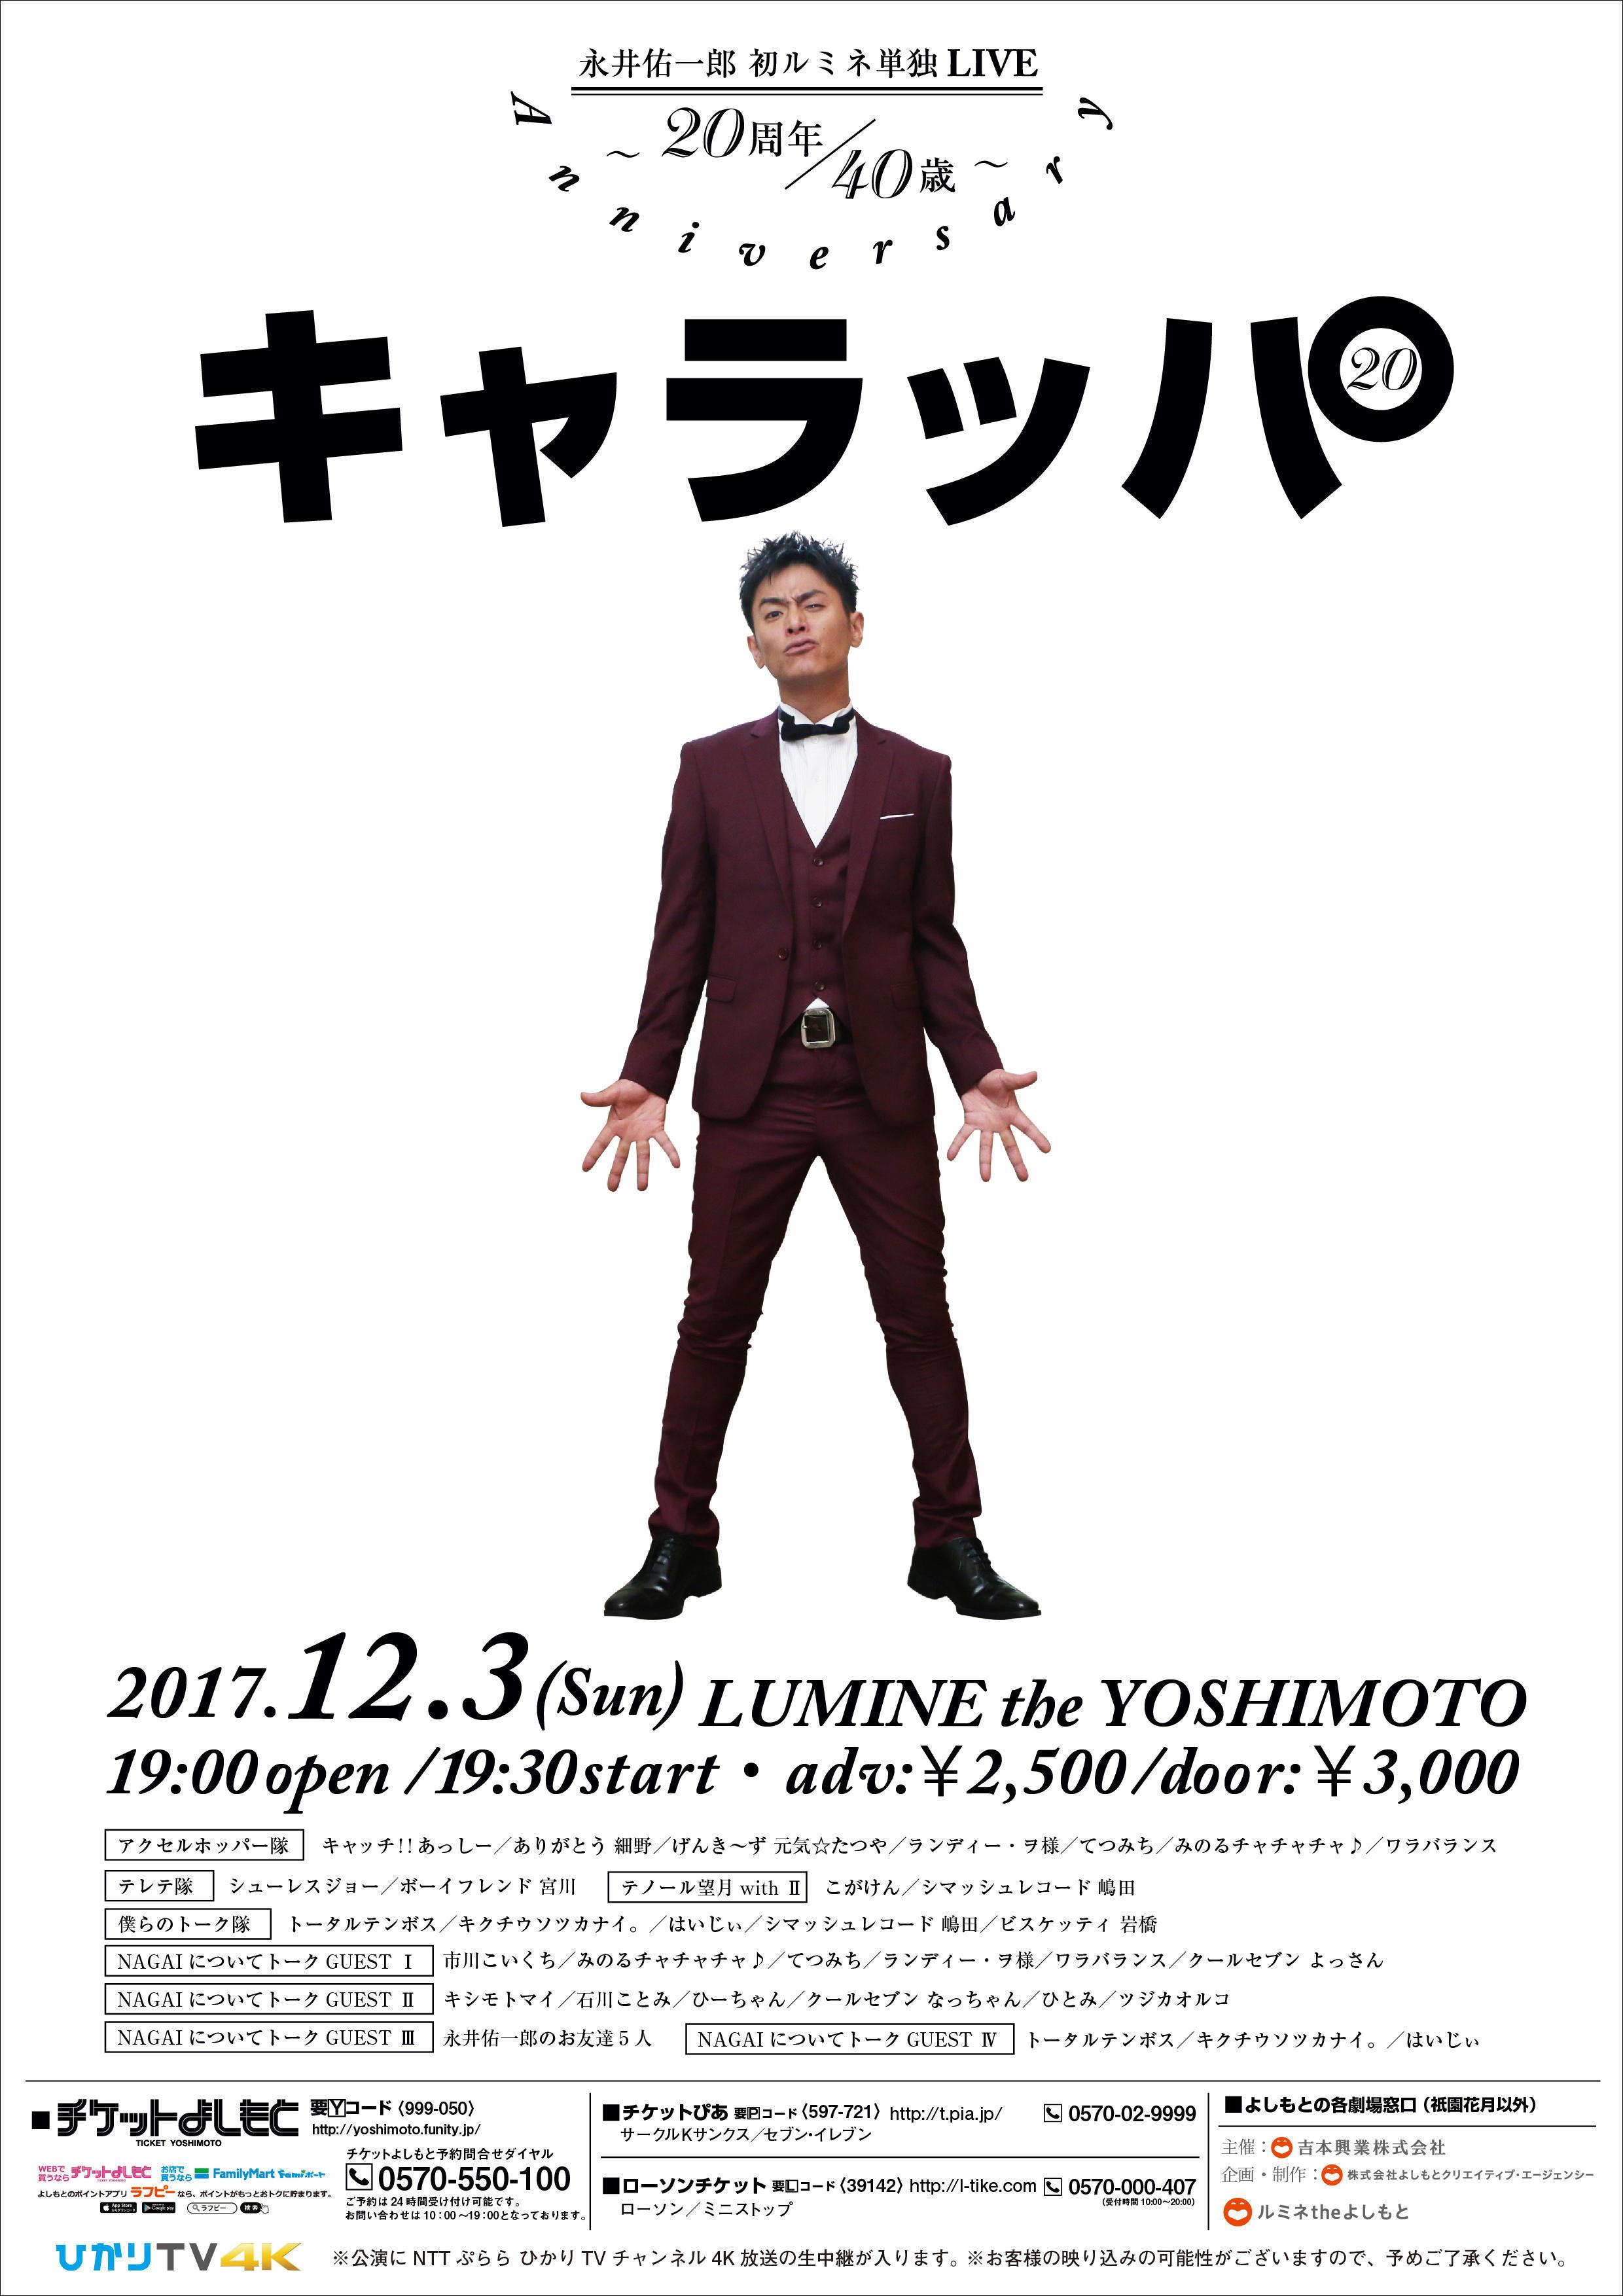 http://news.yoshimoto.co.jp/20171102165405-0914d54639192109775e7c86017f67512b4a0bce.jpg